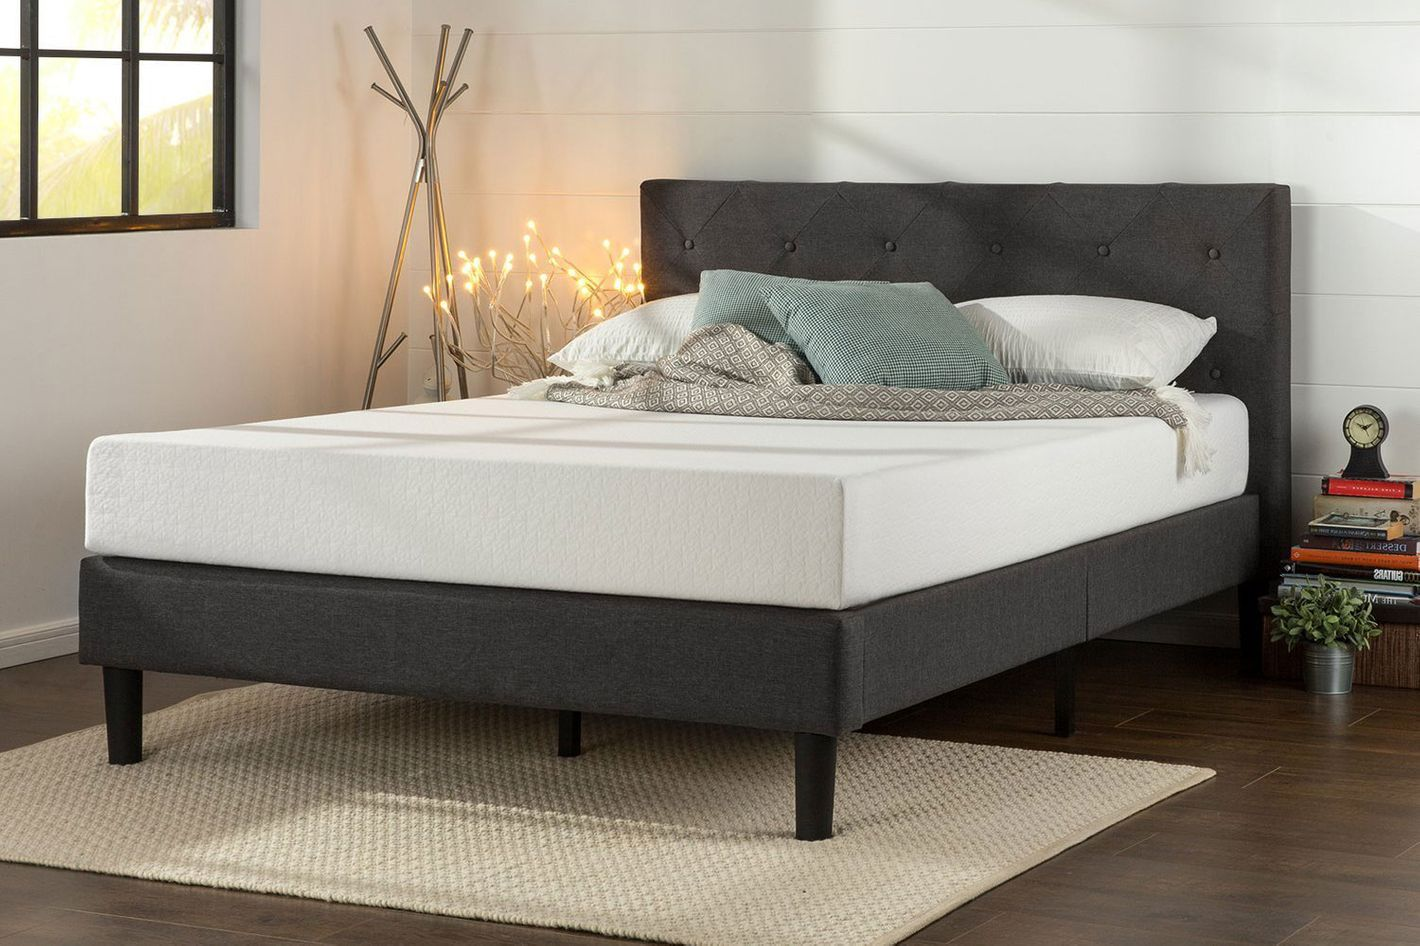 e3b56b30baae Zinus Shalini Upholstered Diamond Stitched Platform Bed in Dark Grey